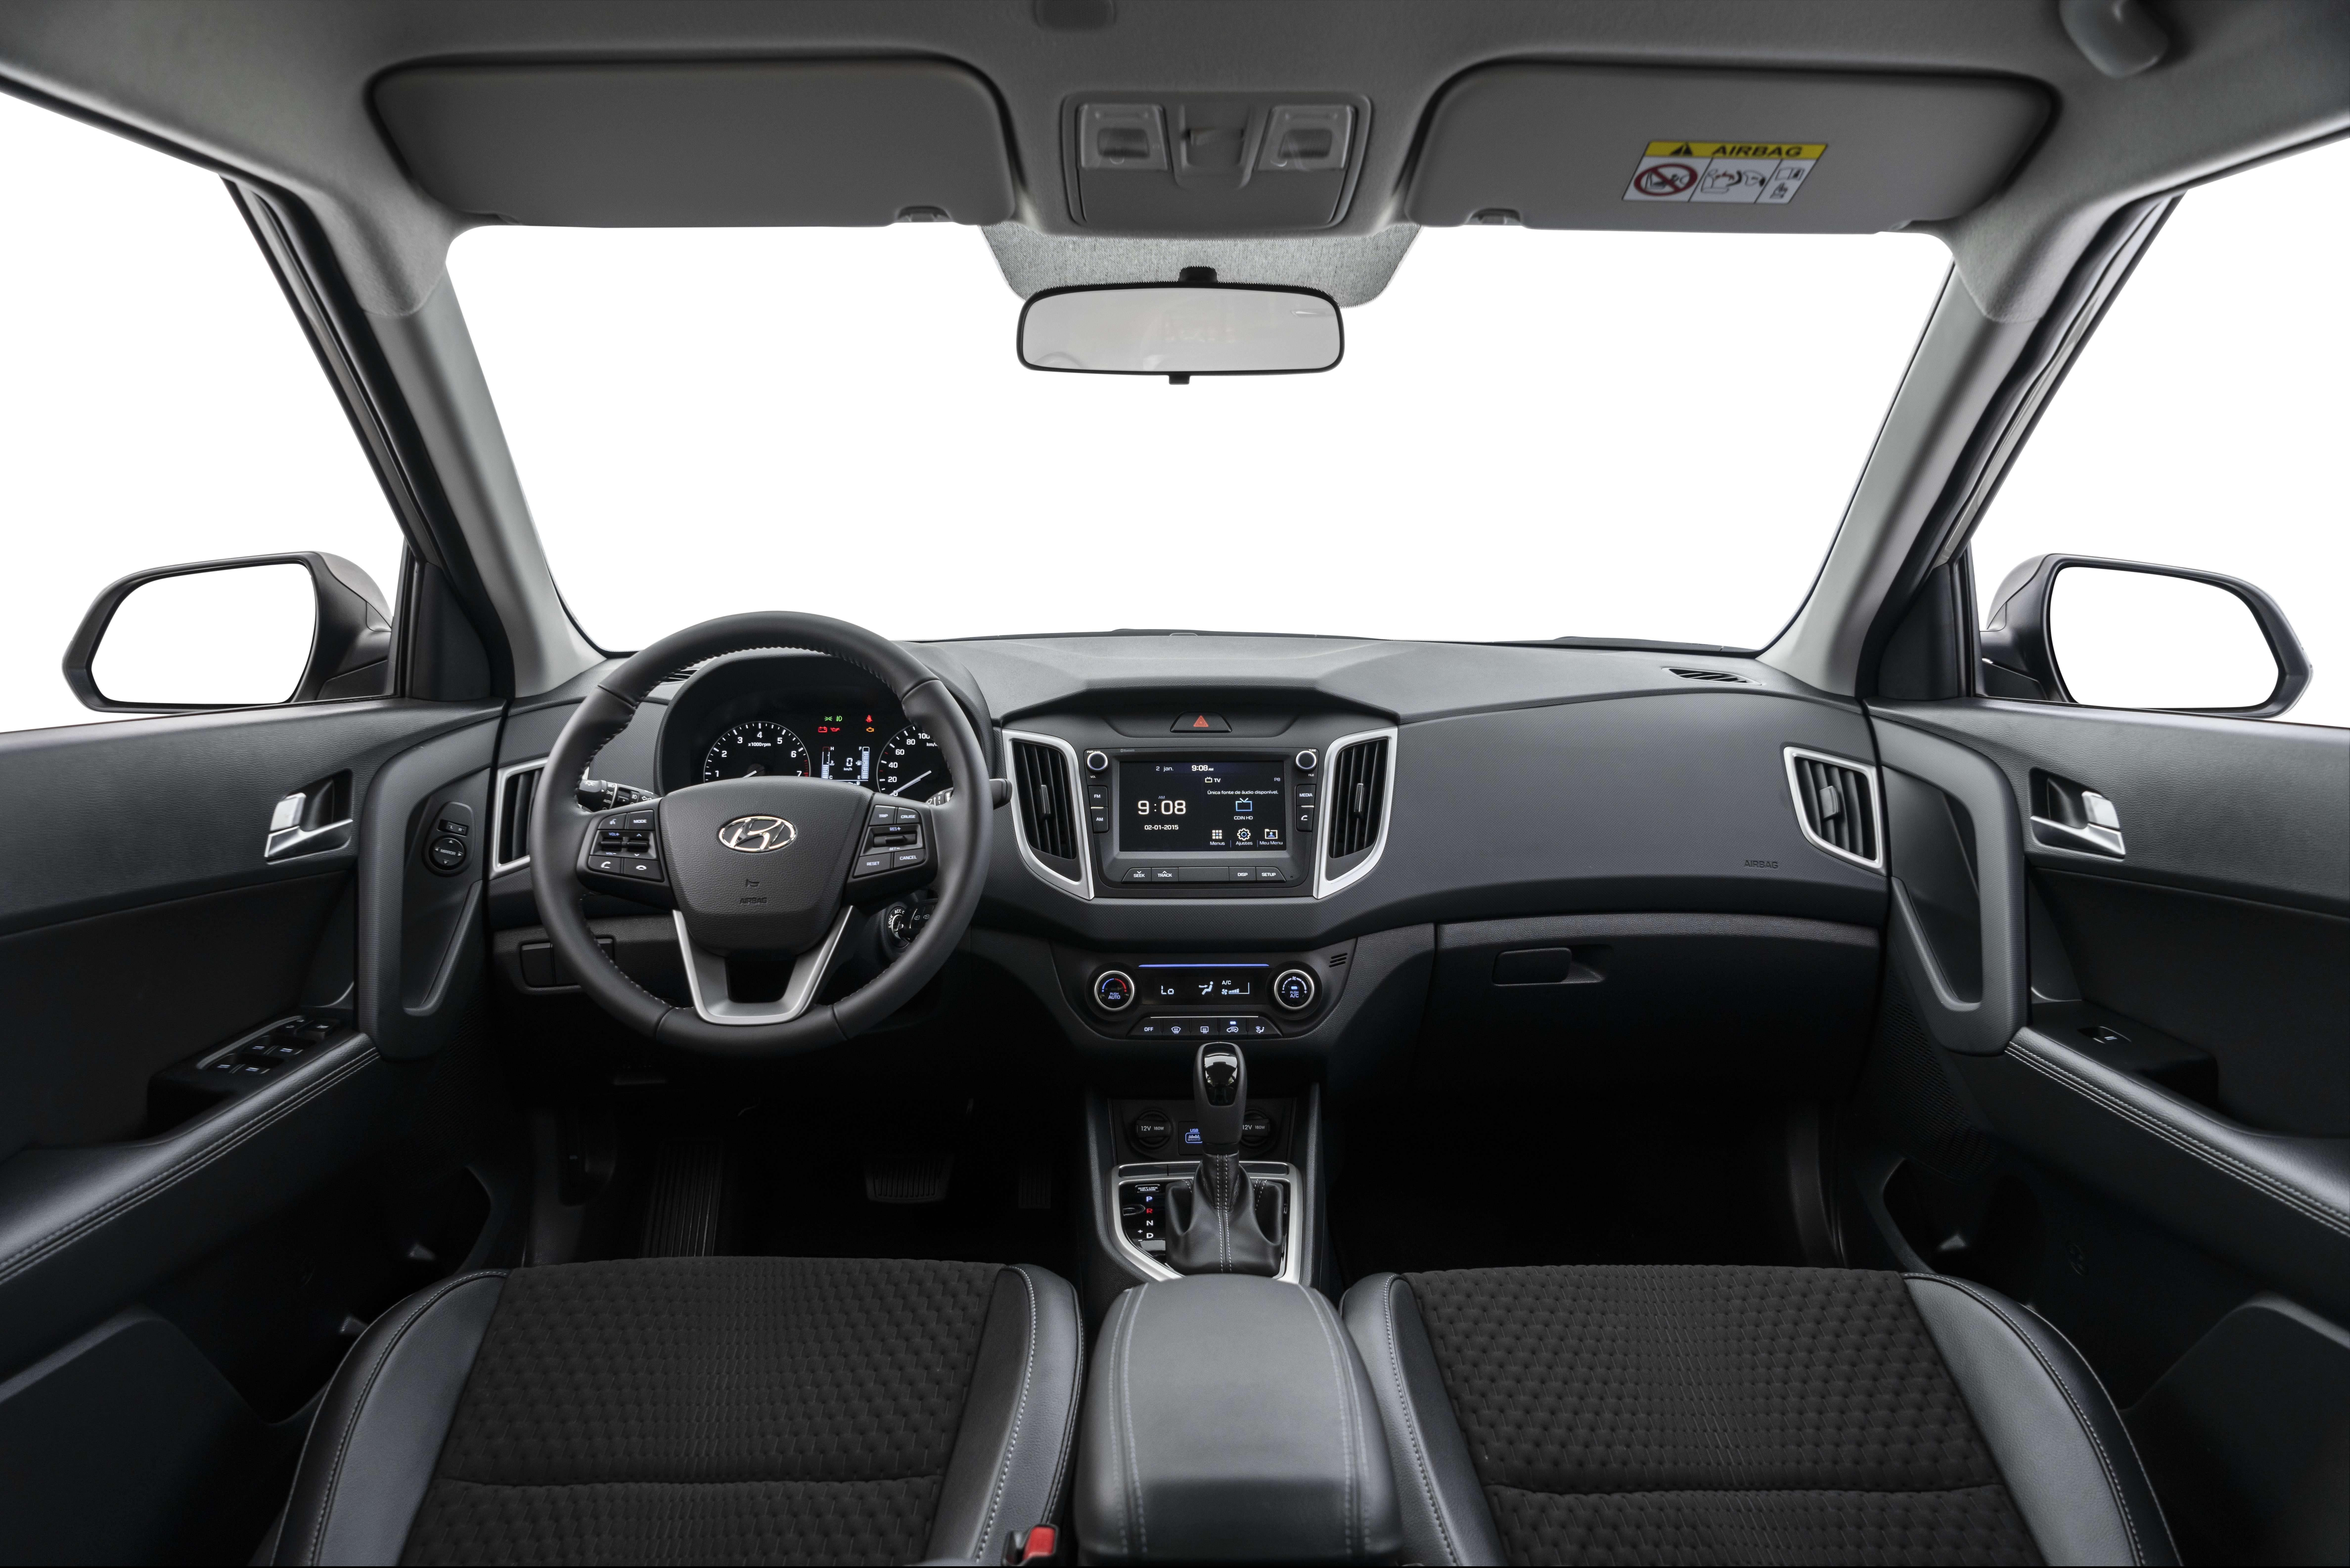 Hyundai-Creta-Smart-Plus-1.6-AT_12-e1597248501776.jpg